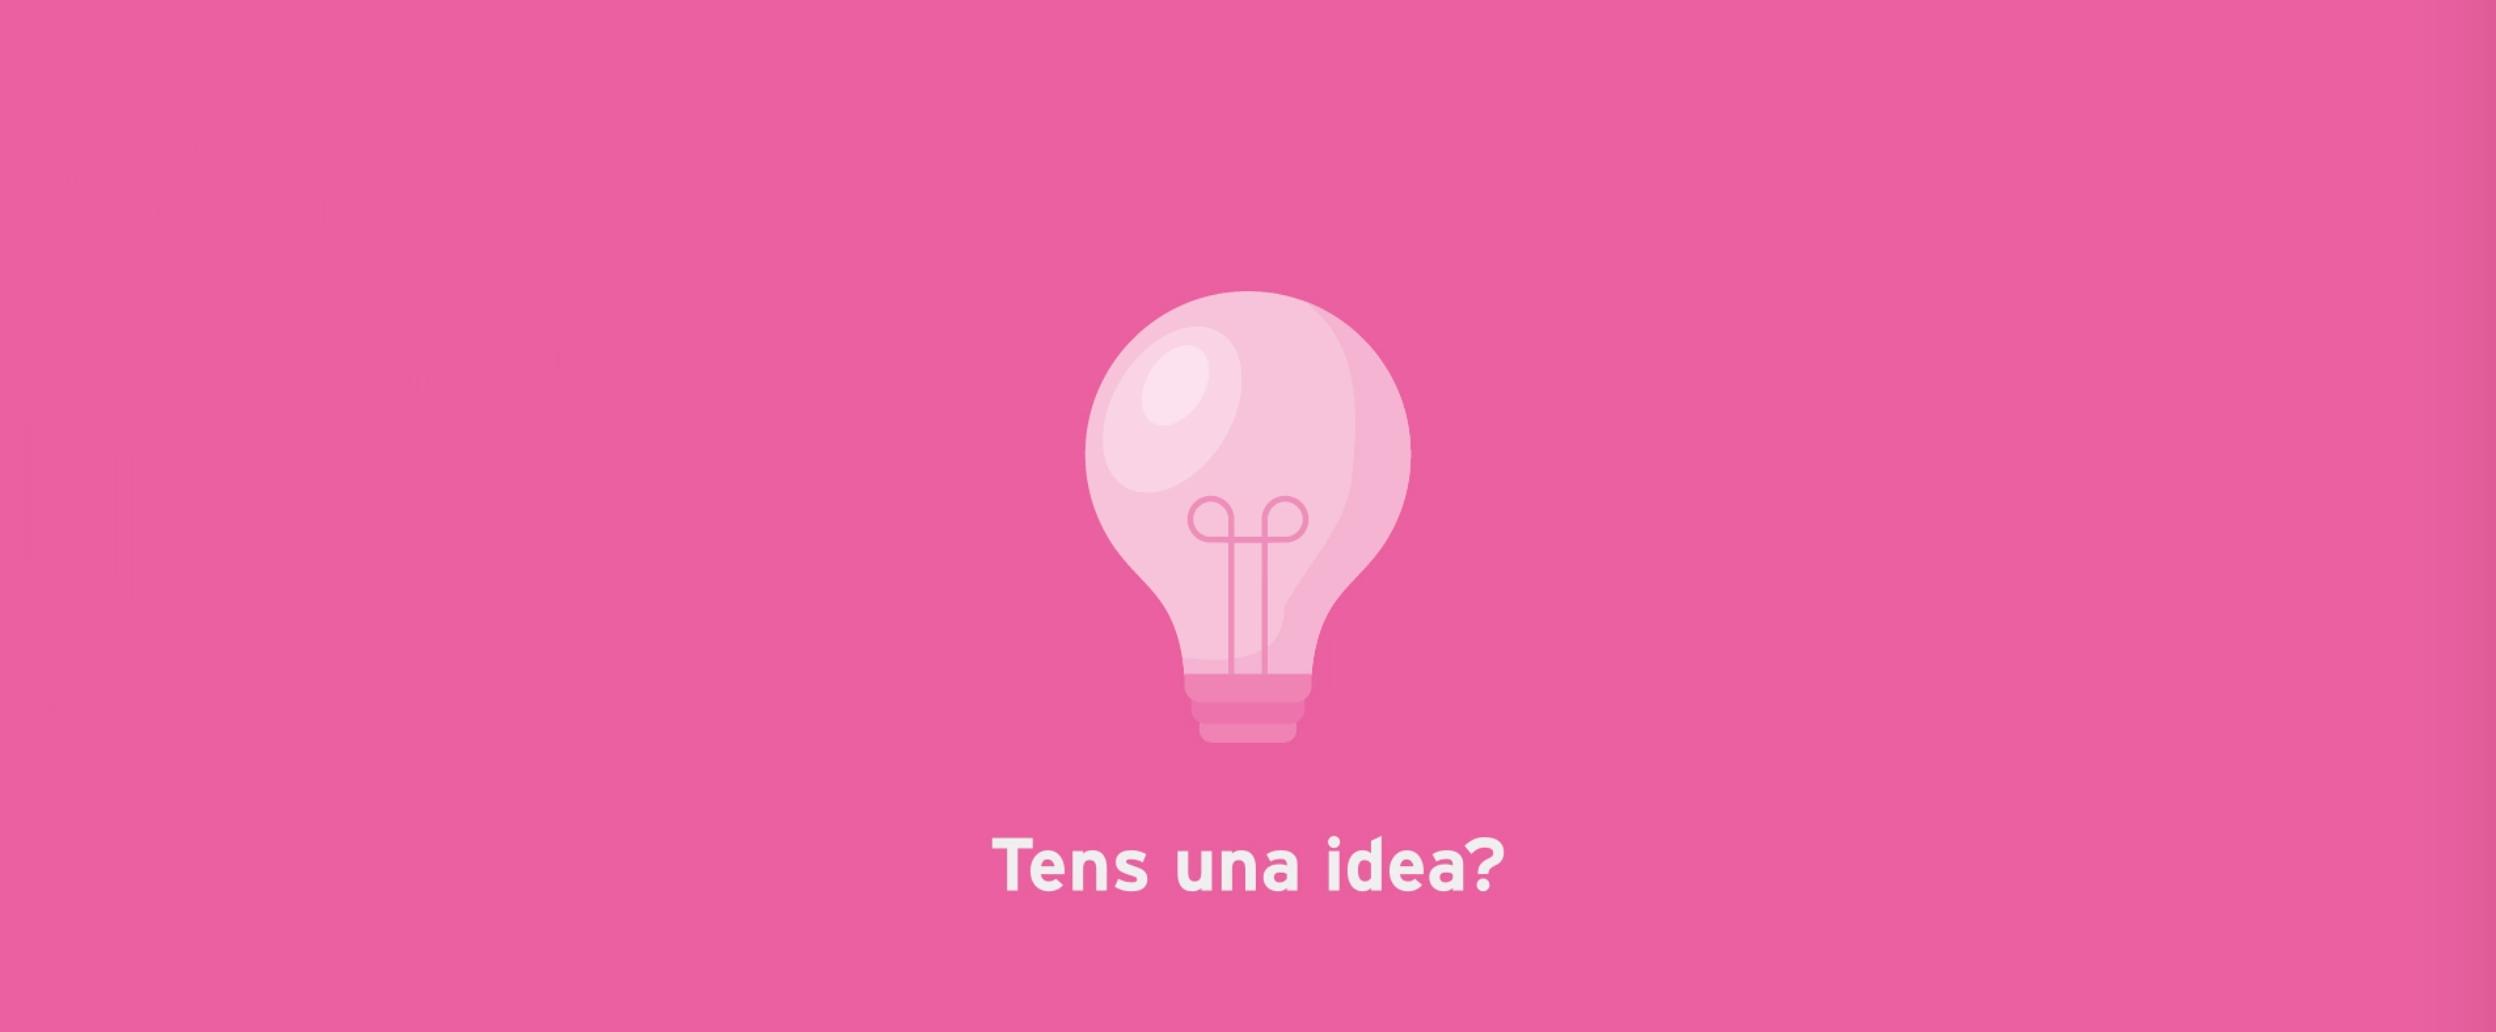 Apunts StoryBoard Disculpi Studio Motion Graphic Design Vilafranca Penedes Angels Pinyol Carla Elias 001 11.32.53 - APUNTS - Vídeo dels serveis de la companyia